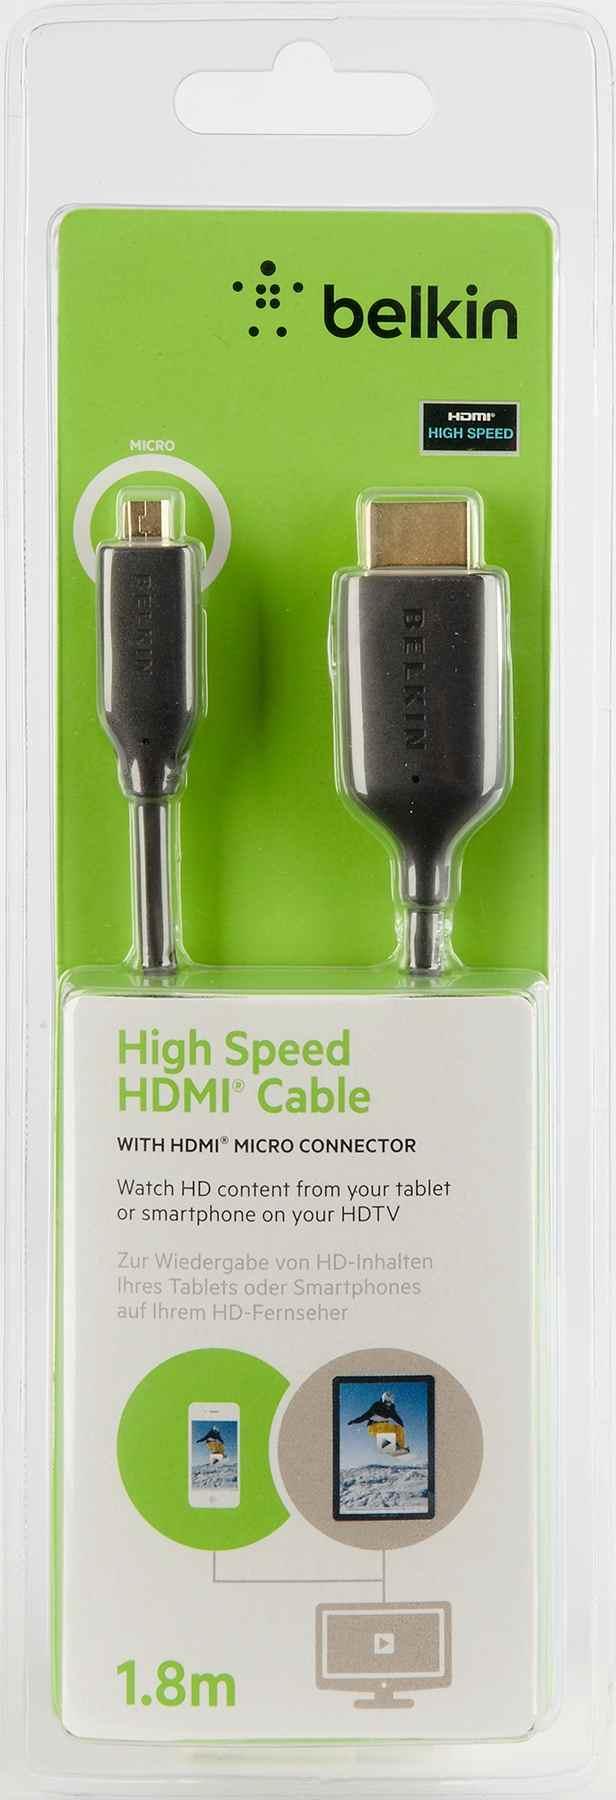 Belkin Micro-hdmi - Hdmi Av10098bf1 8m